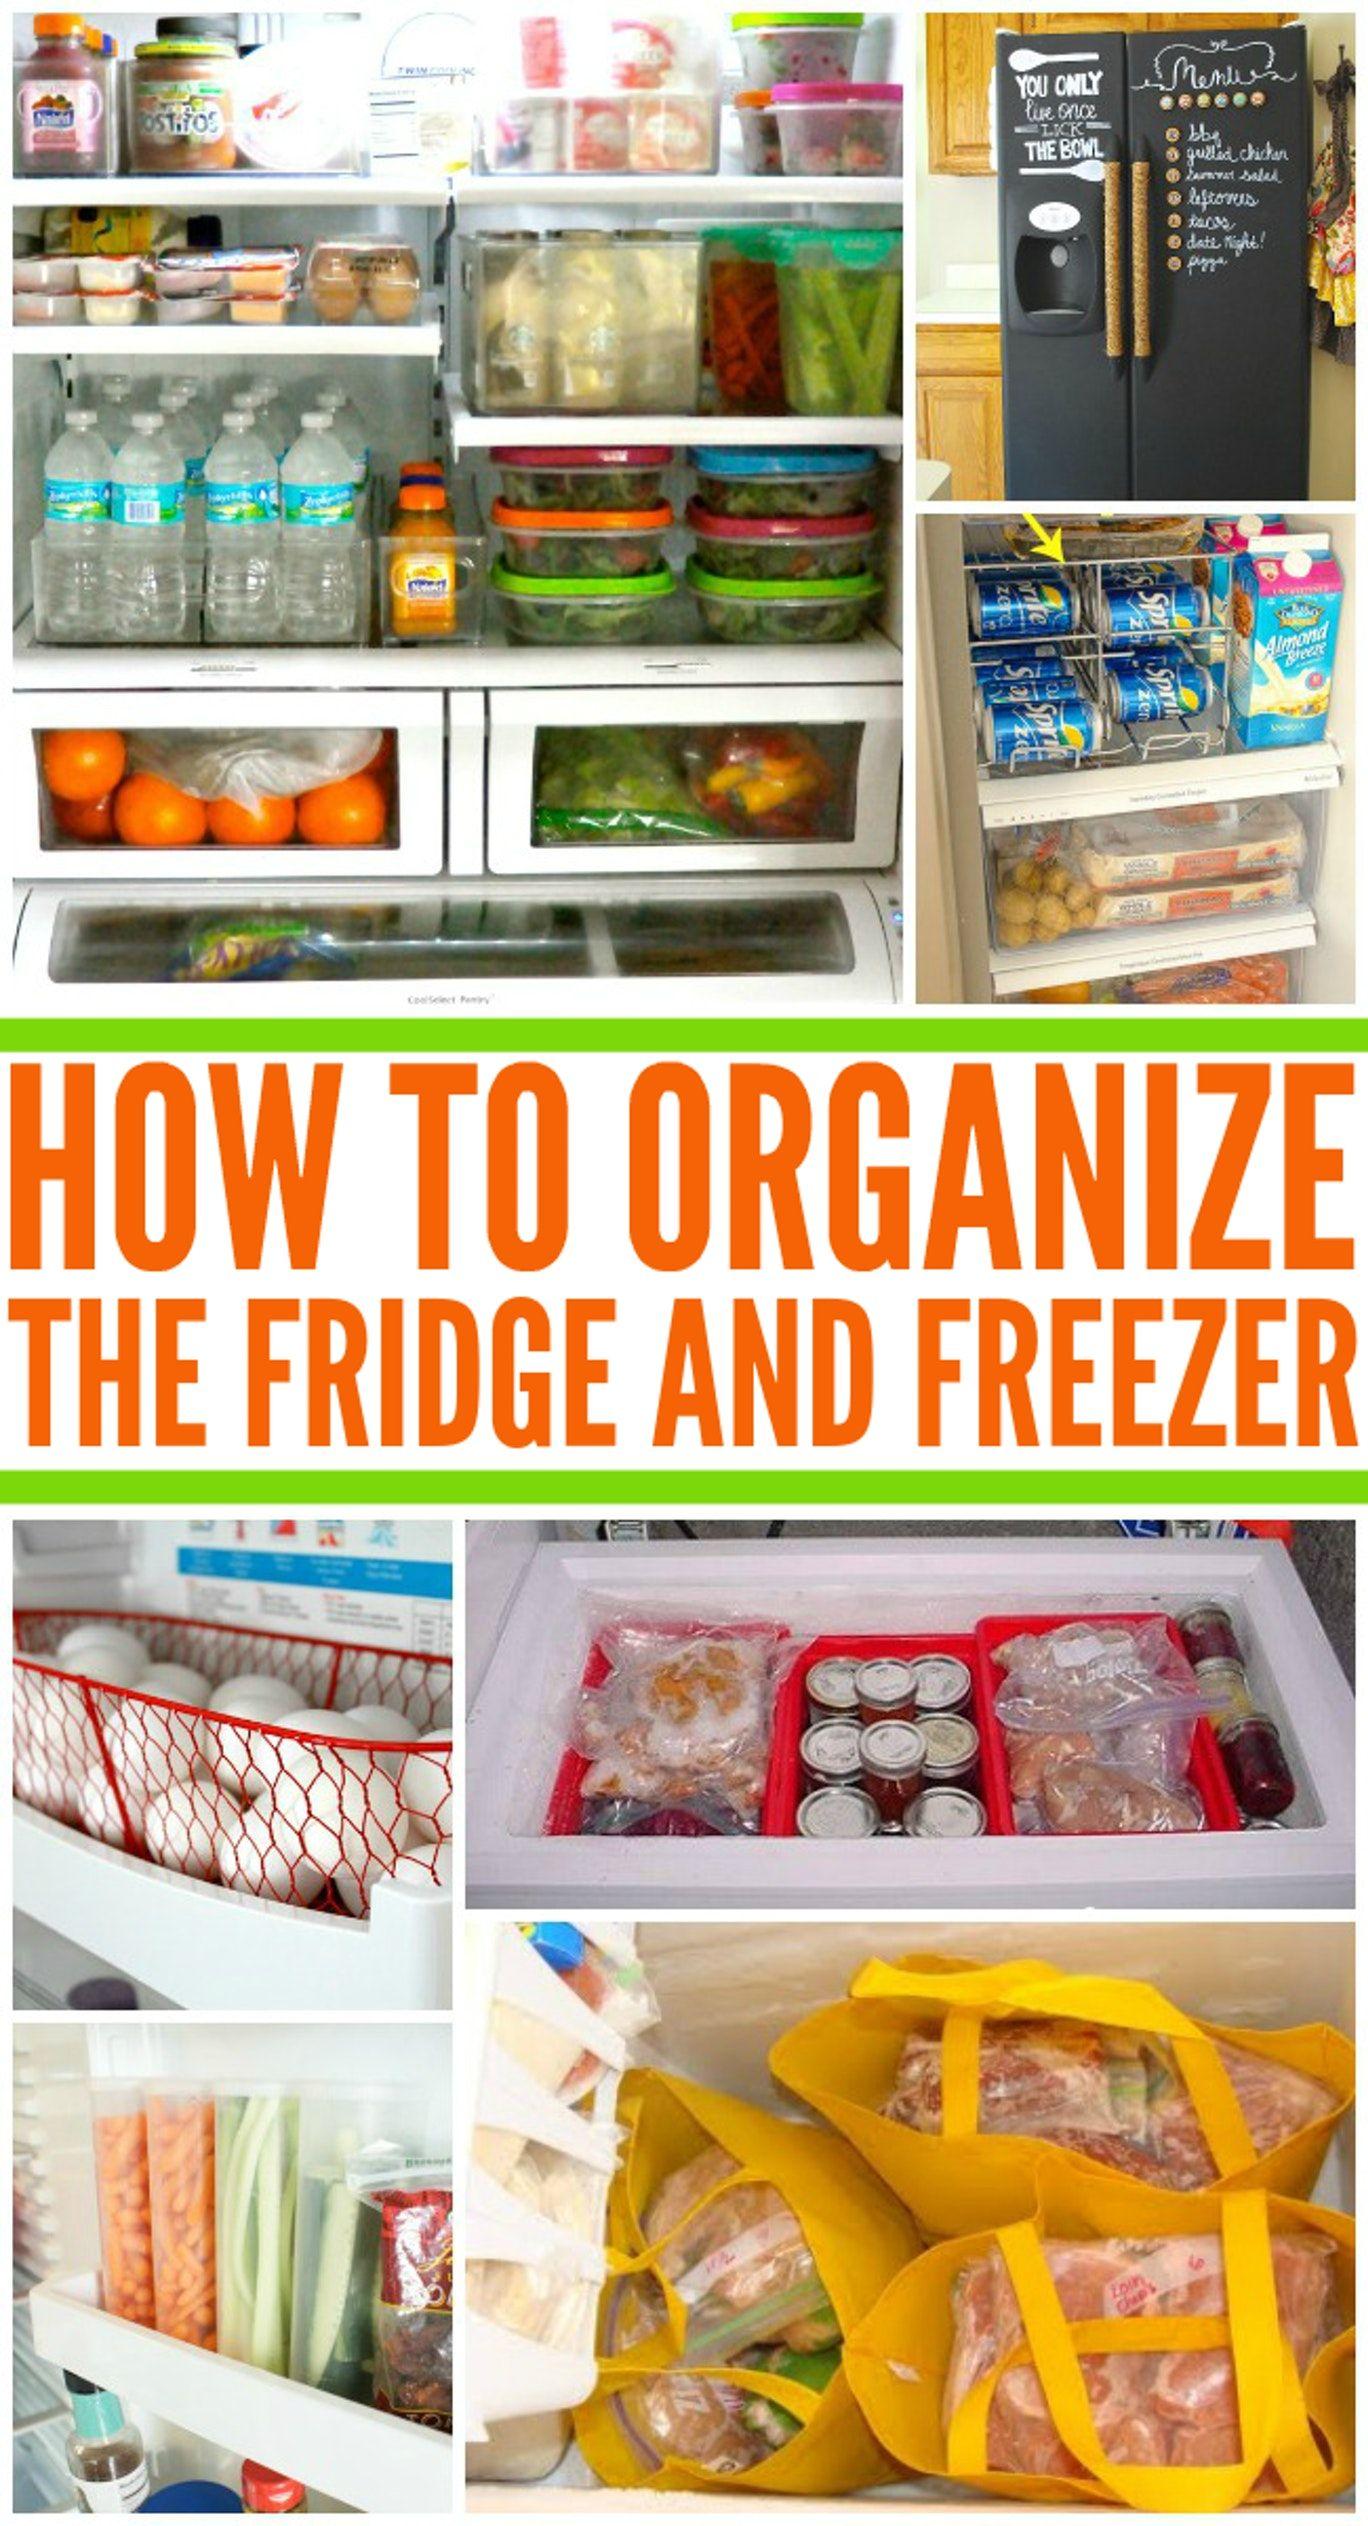 How to Organize the Fridge and Freezer Freezer